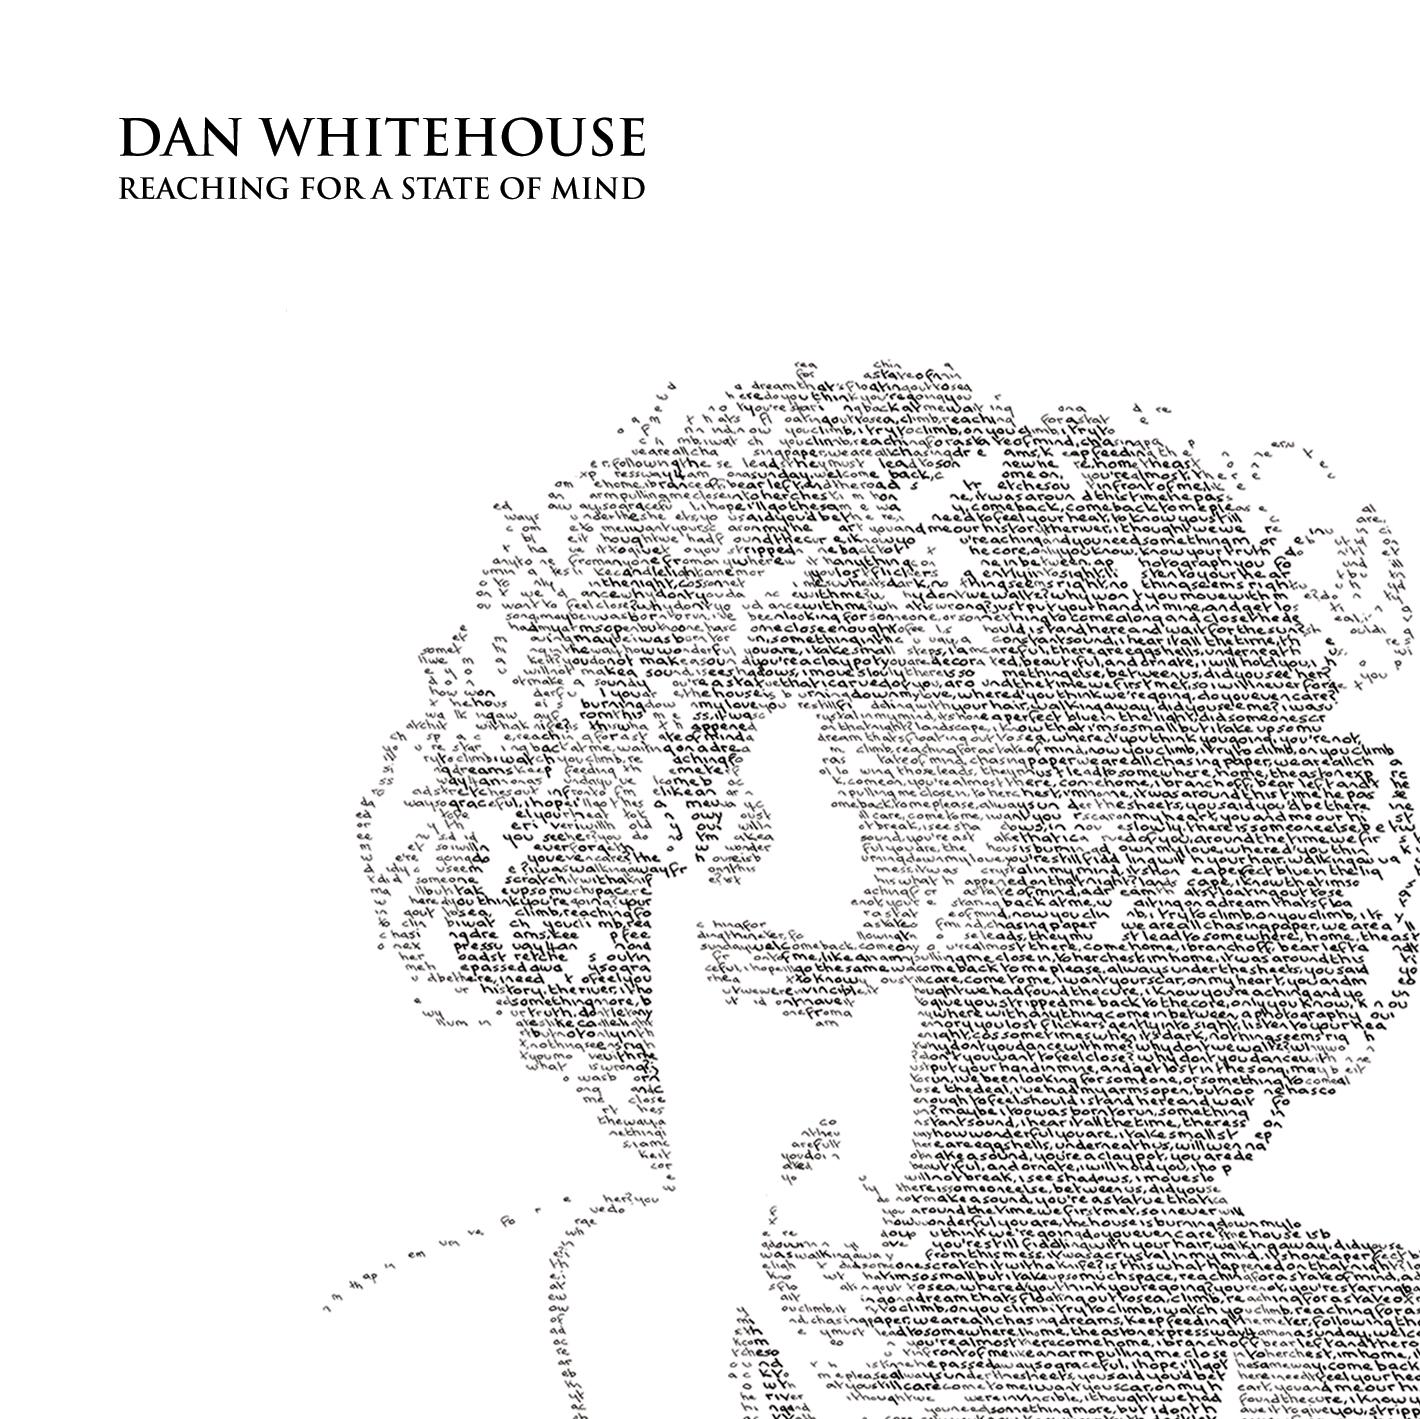 Dan Whitehouse | Dan Whitehouse